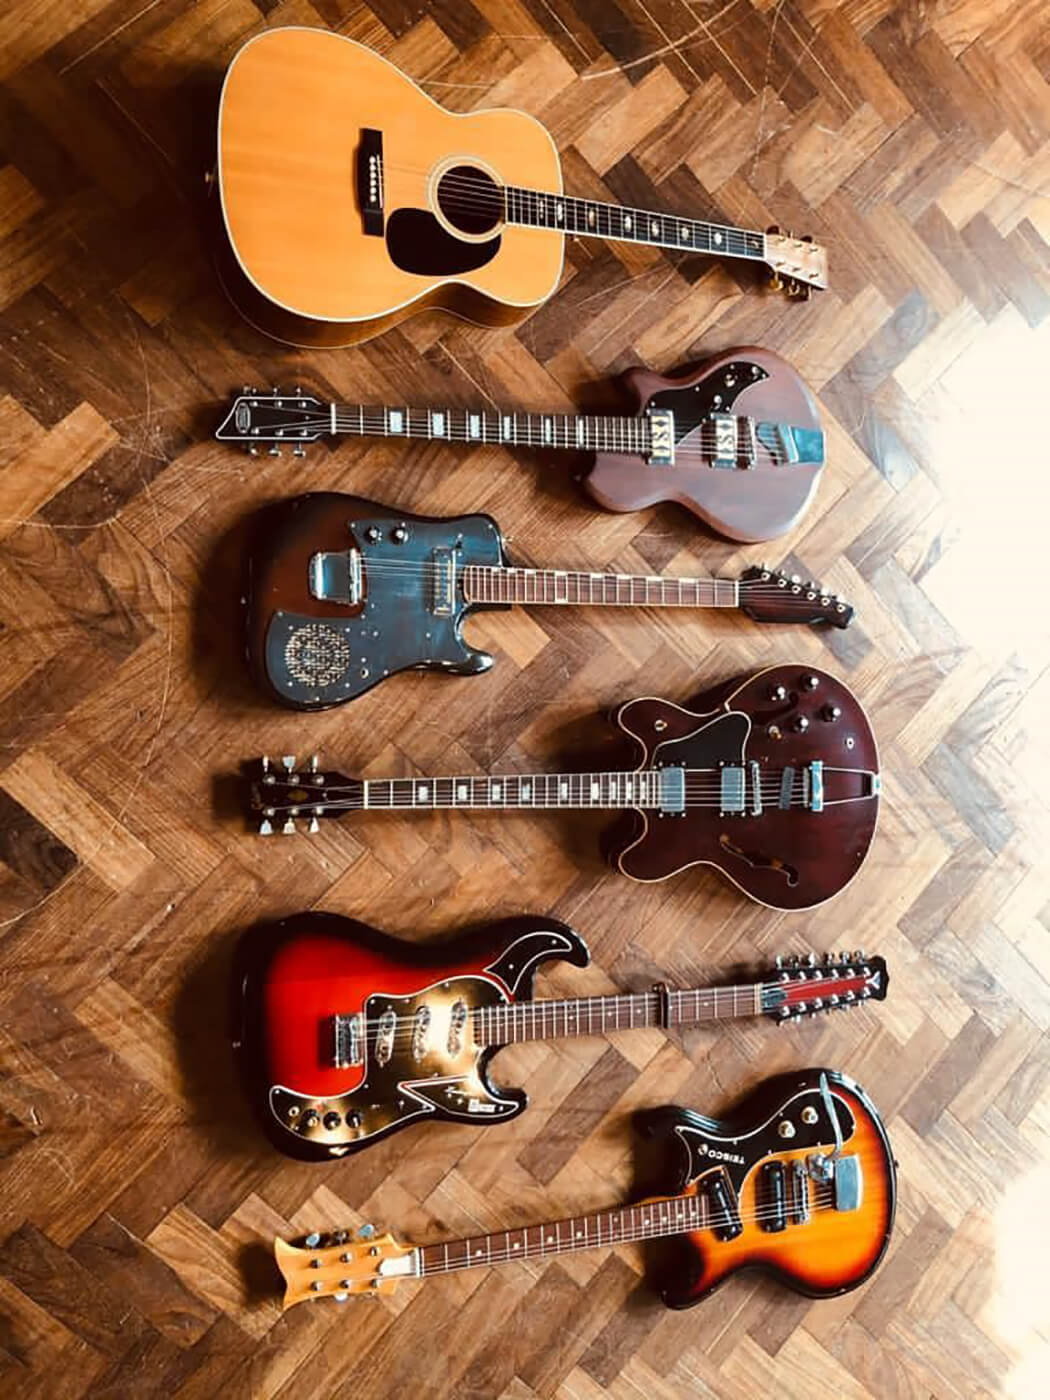 James Skelly's Guitars